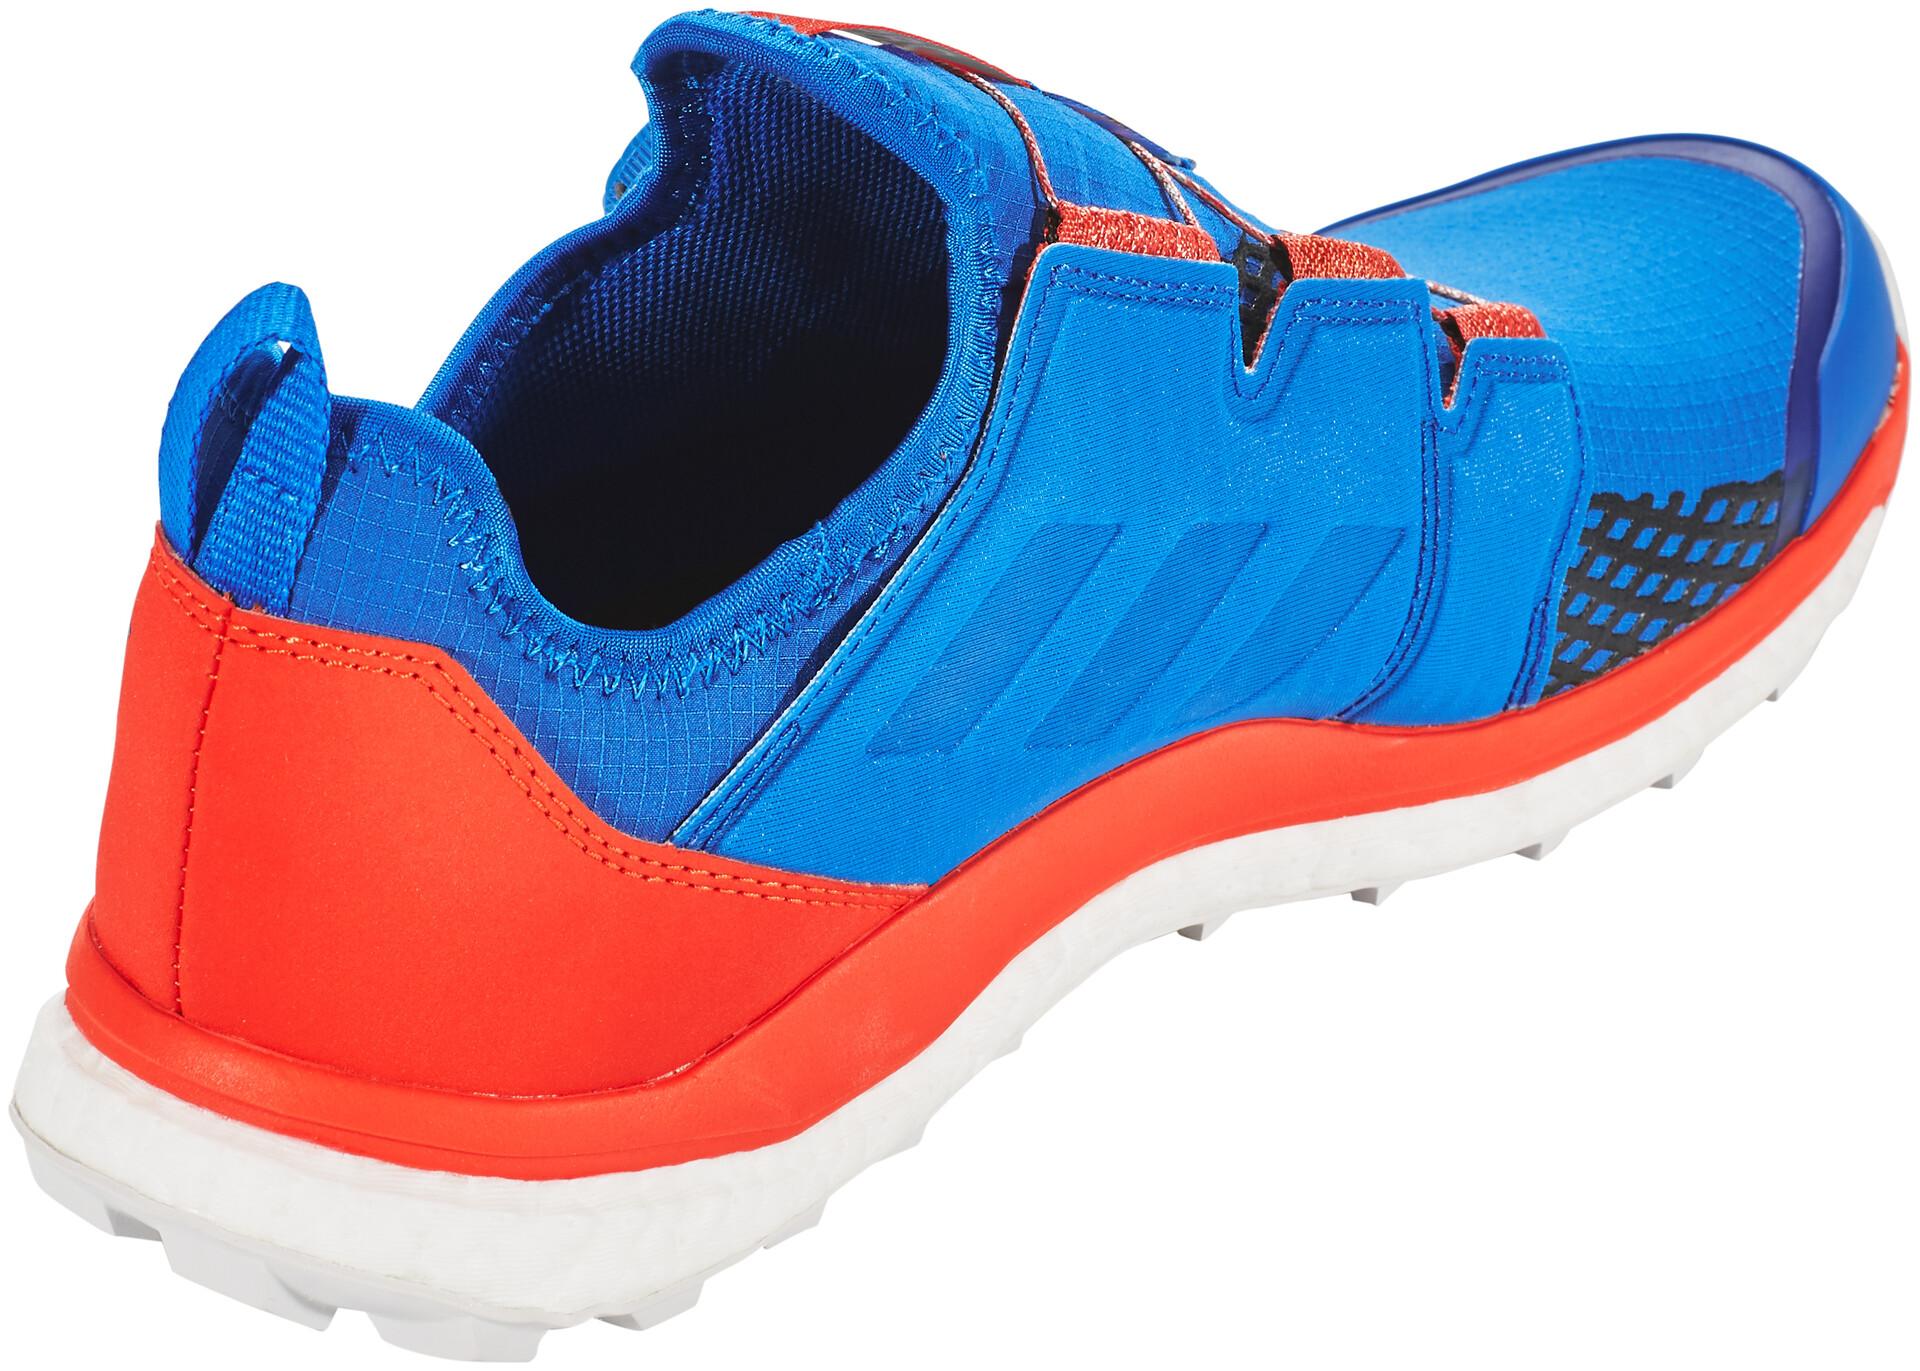 adidas TERREX Agravic Boa Schoenen Heren, blue beautycore blackactive red